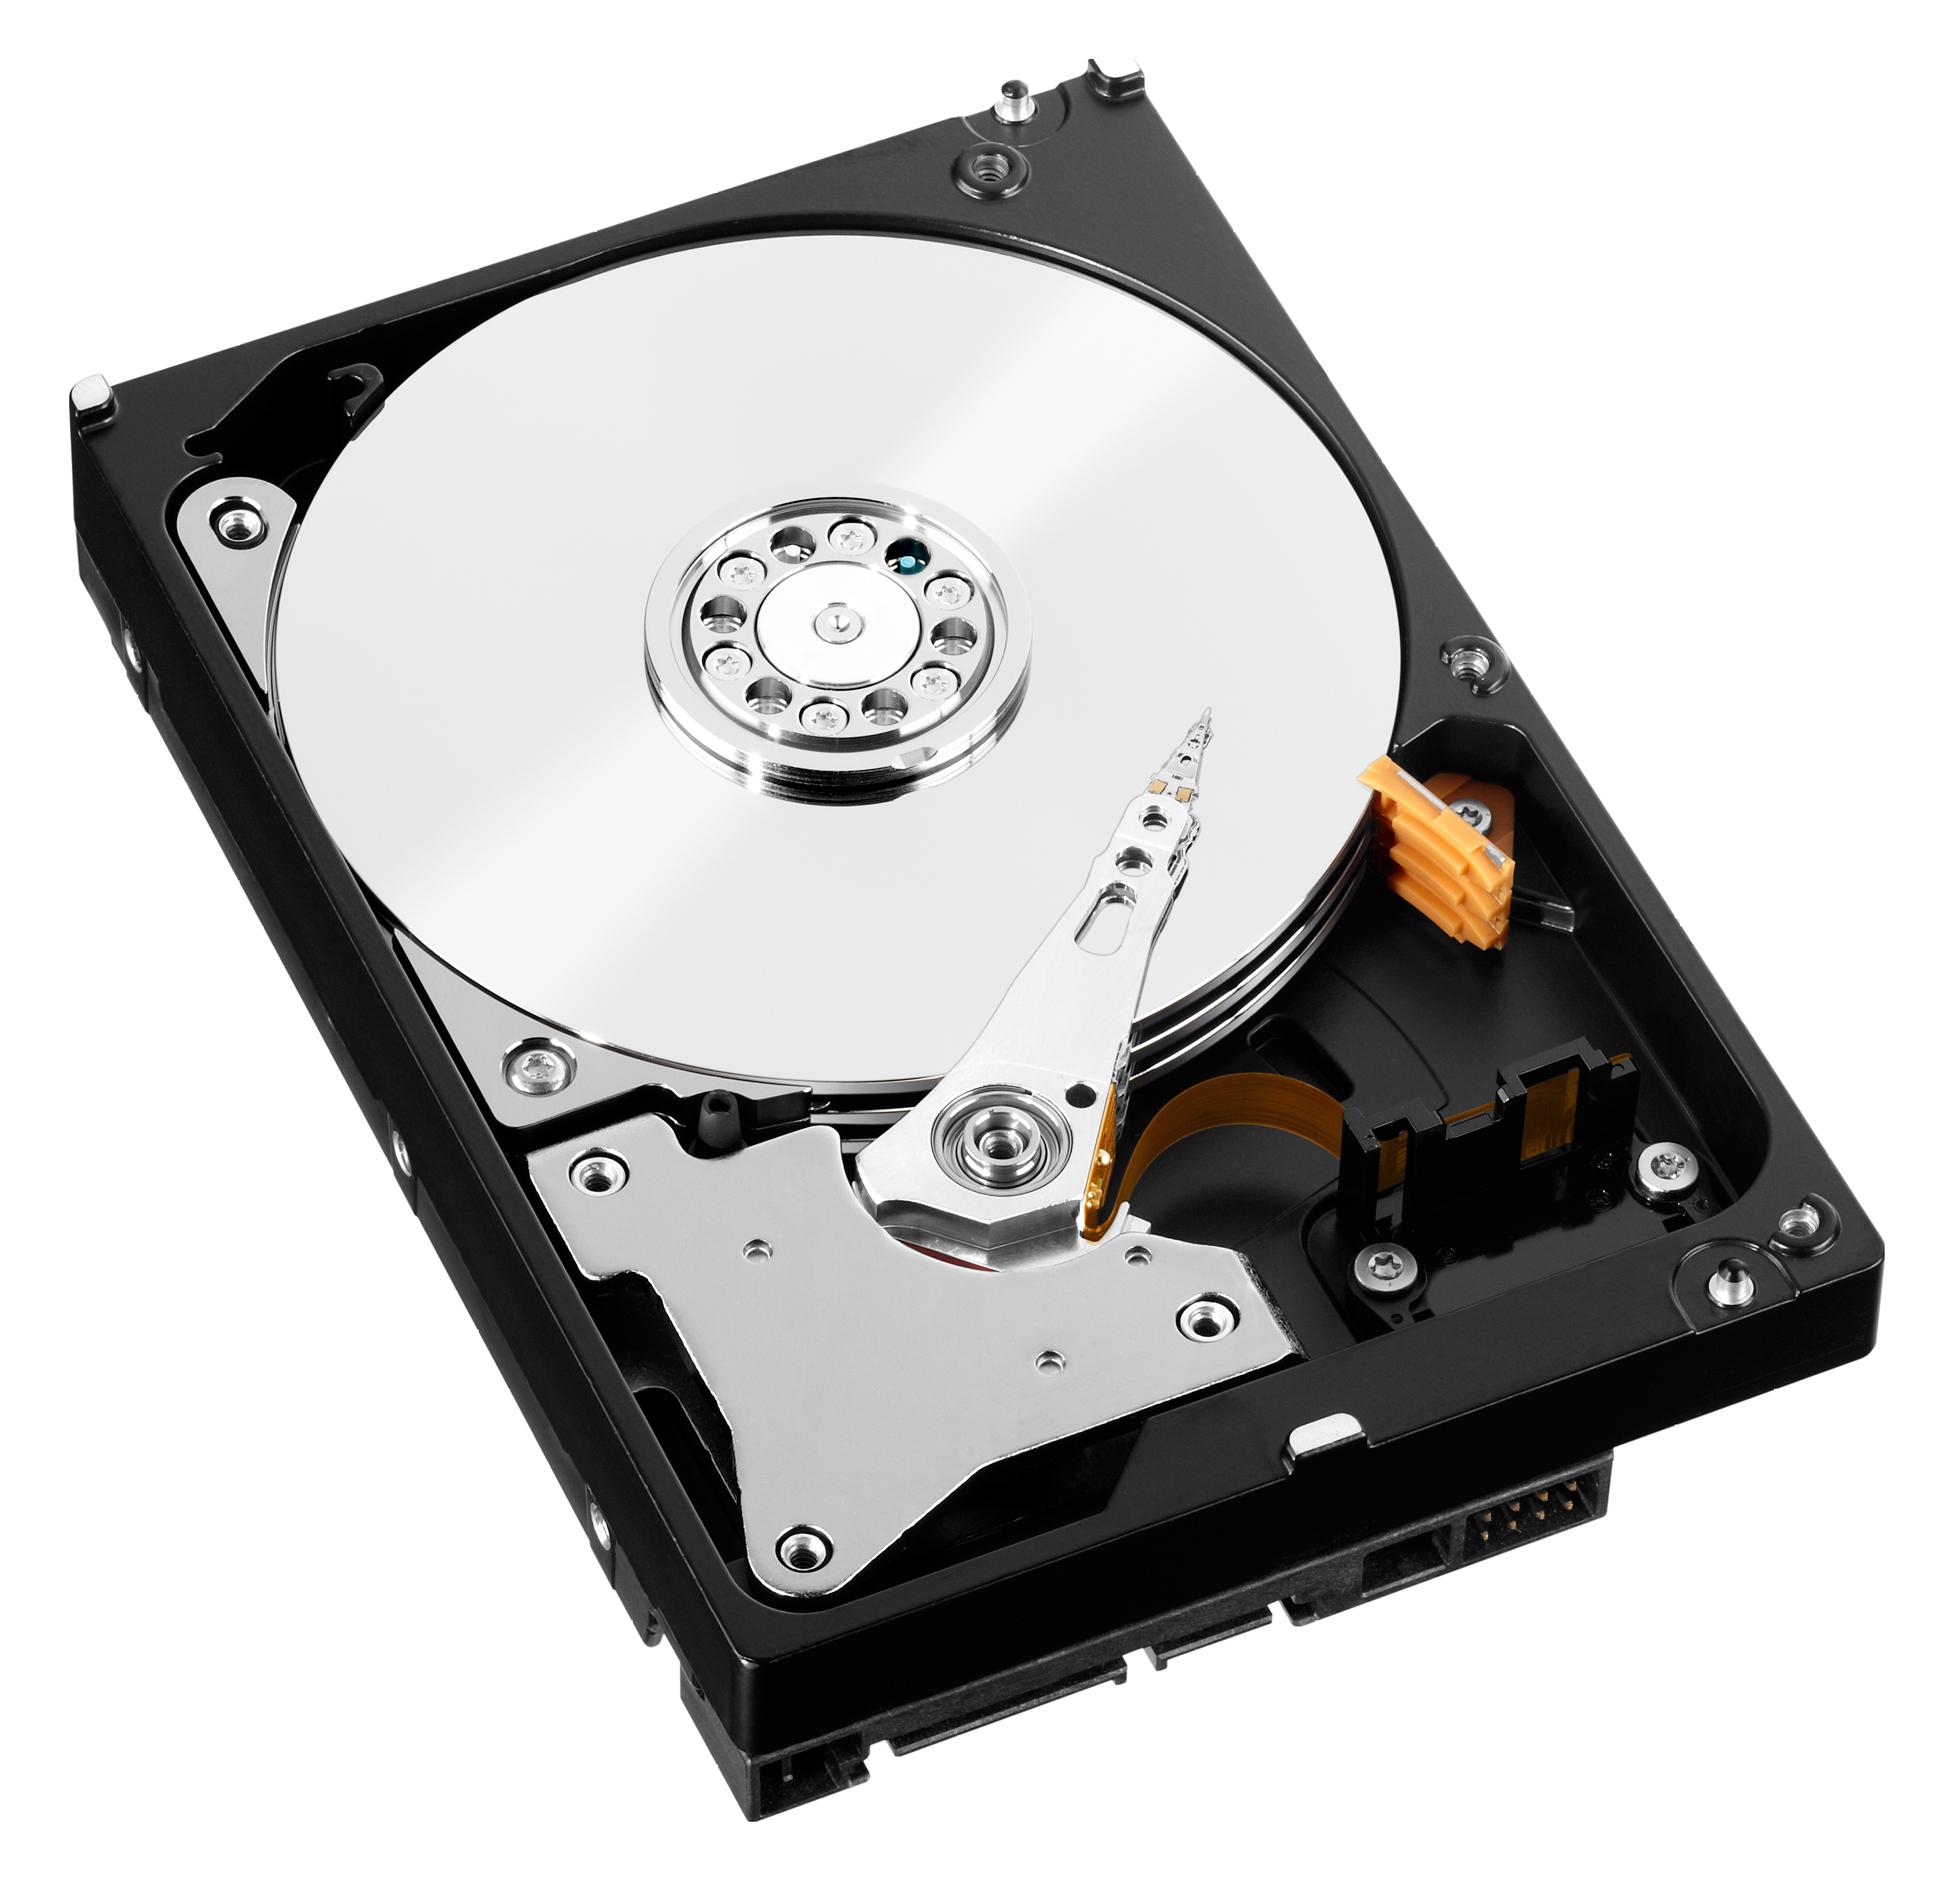 Hdd Hard Disk Drive Png Image